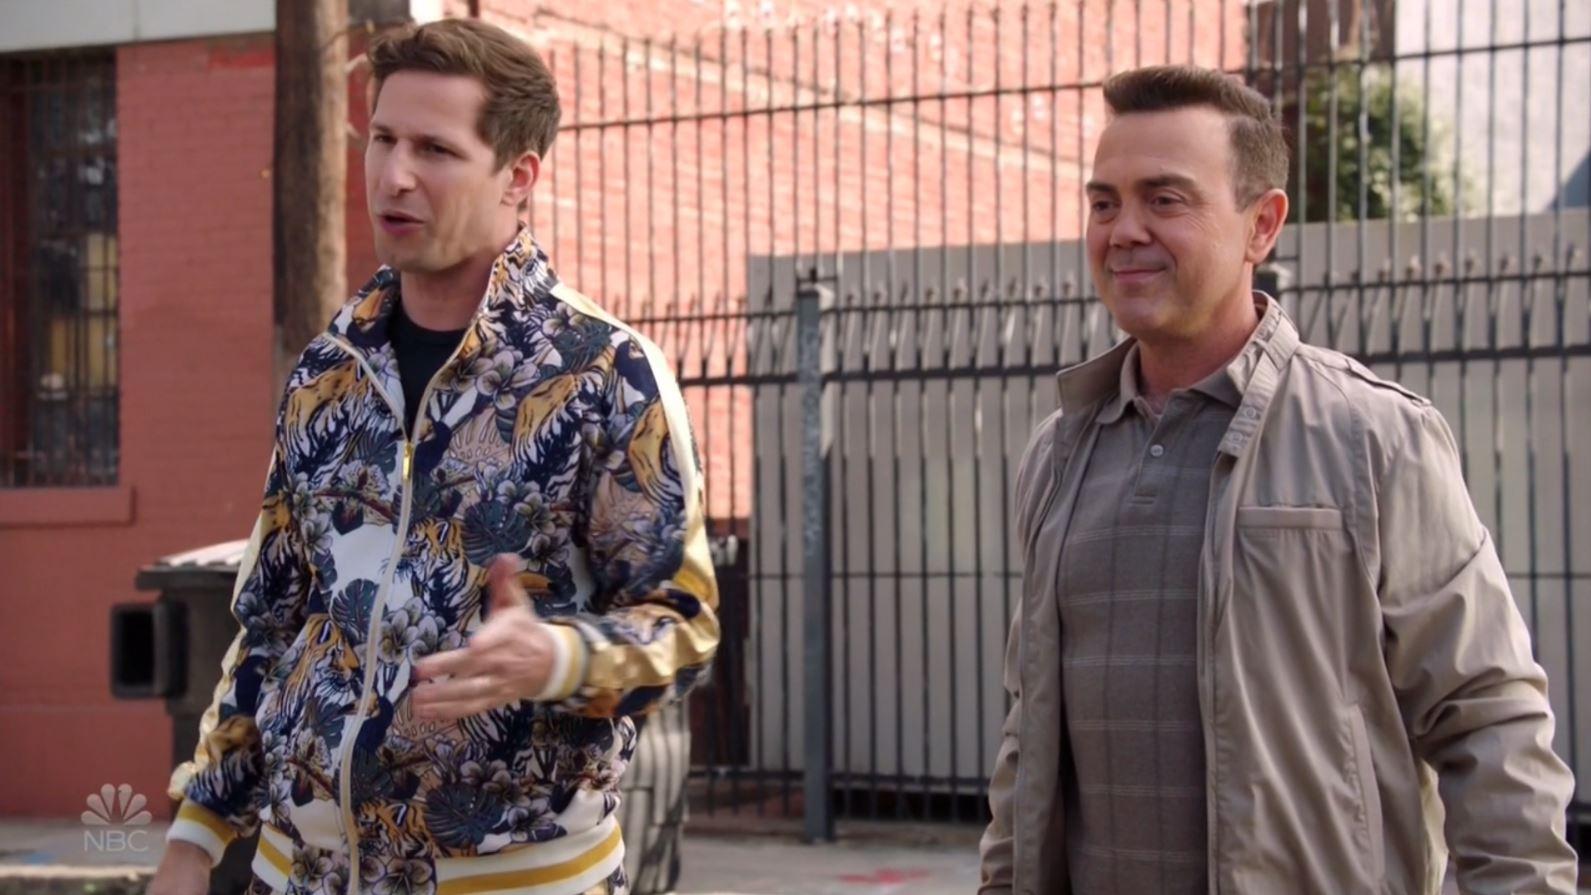 Brooklyn Nine-Nine Season 8 Episodes 7 and 8 Spoilers & Preview